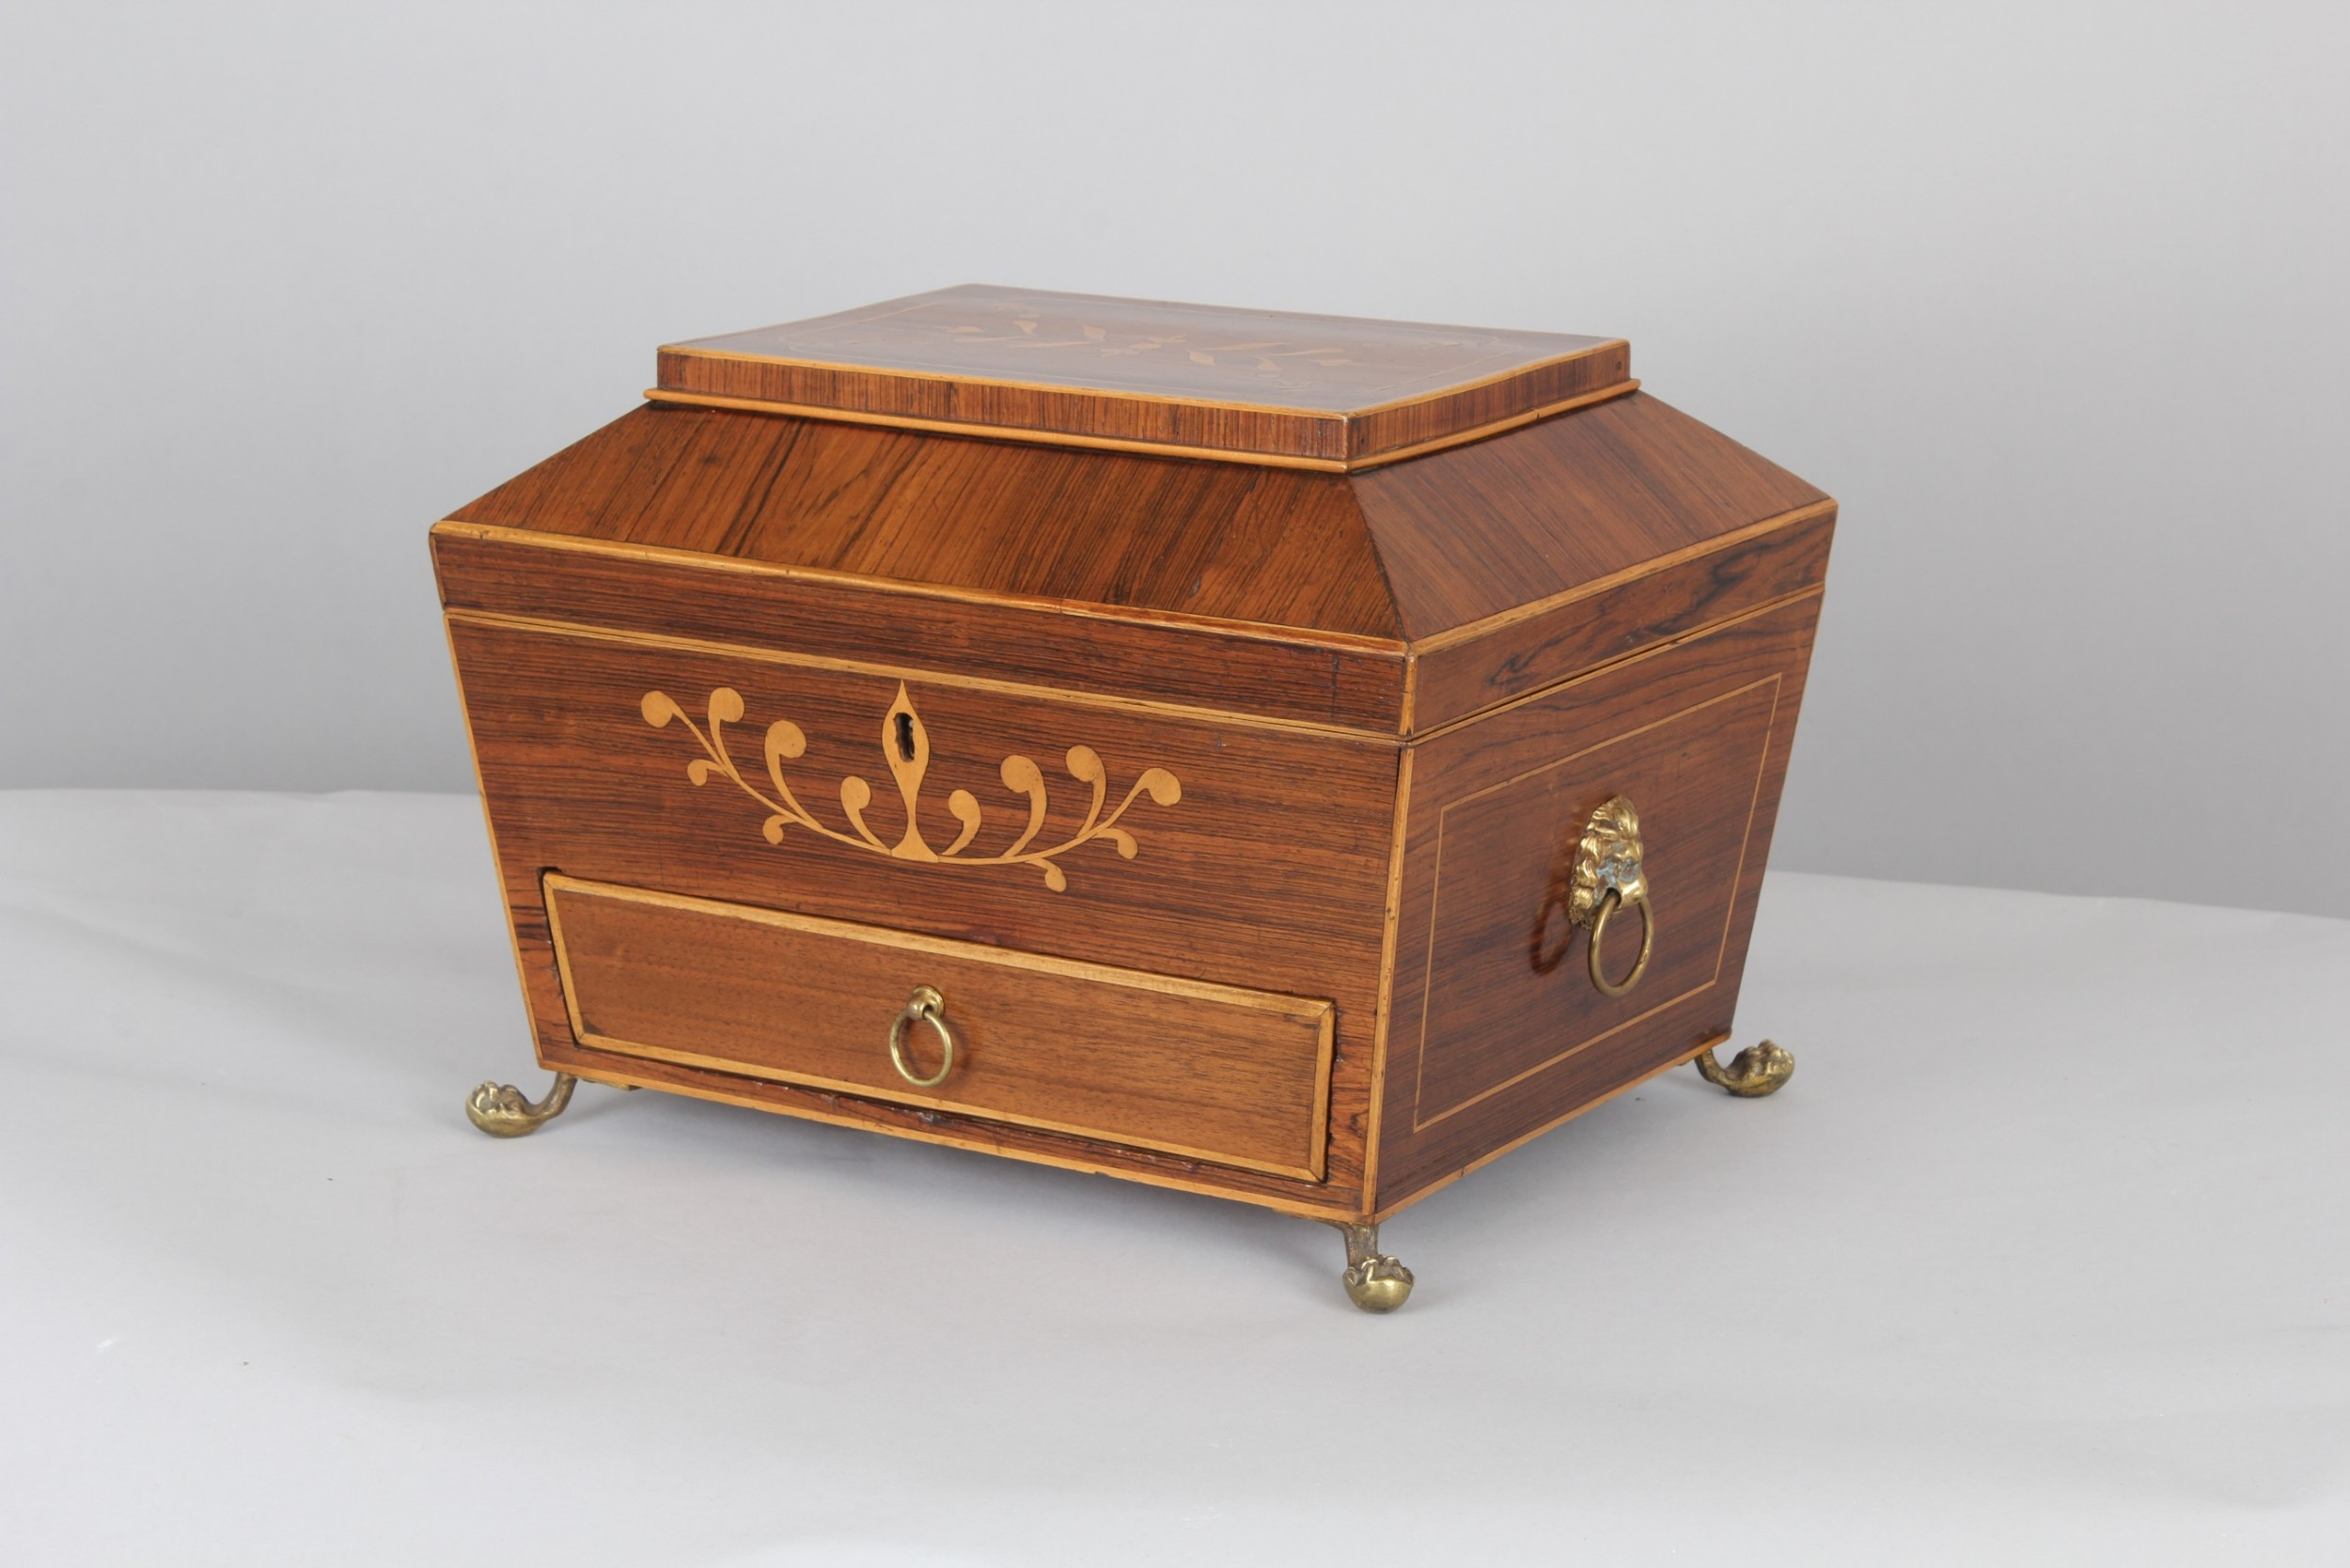 regency period mahogany work box of sarcophagus shape